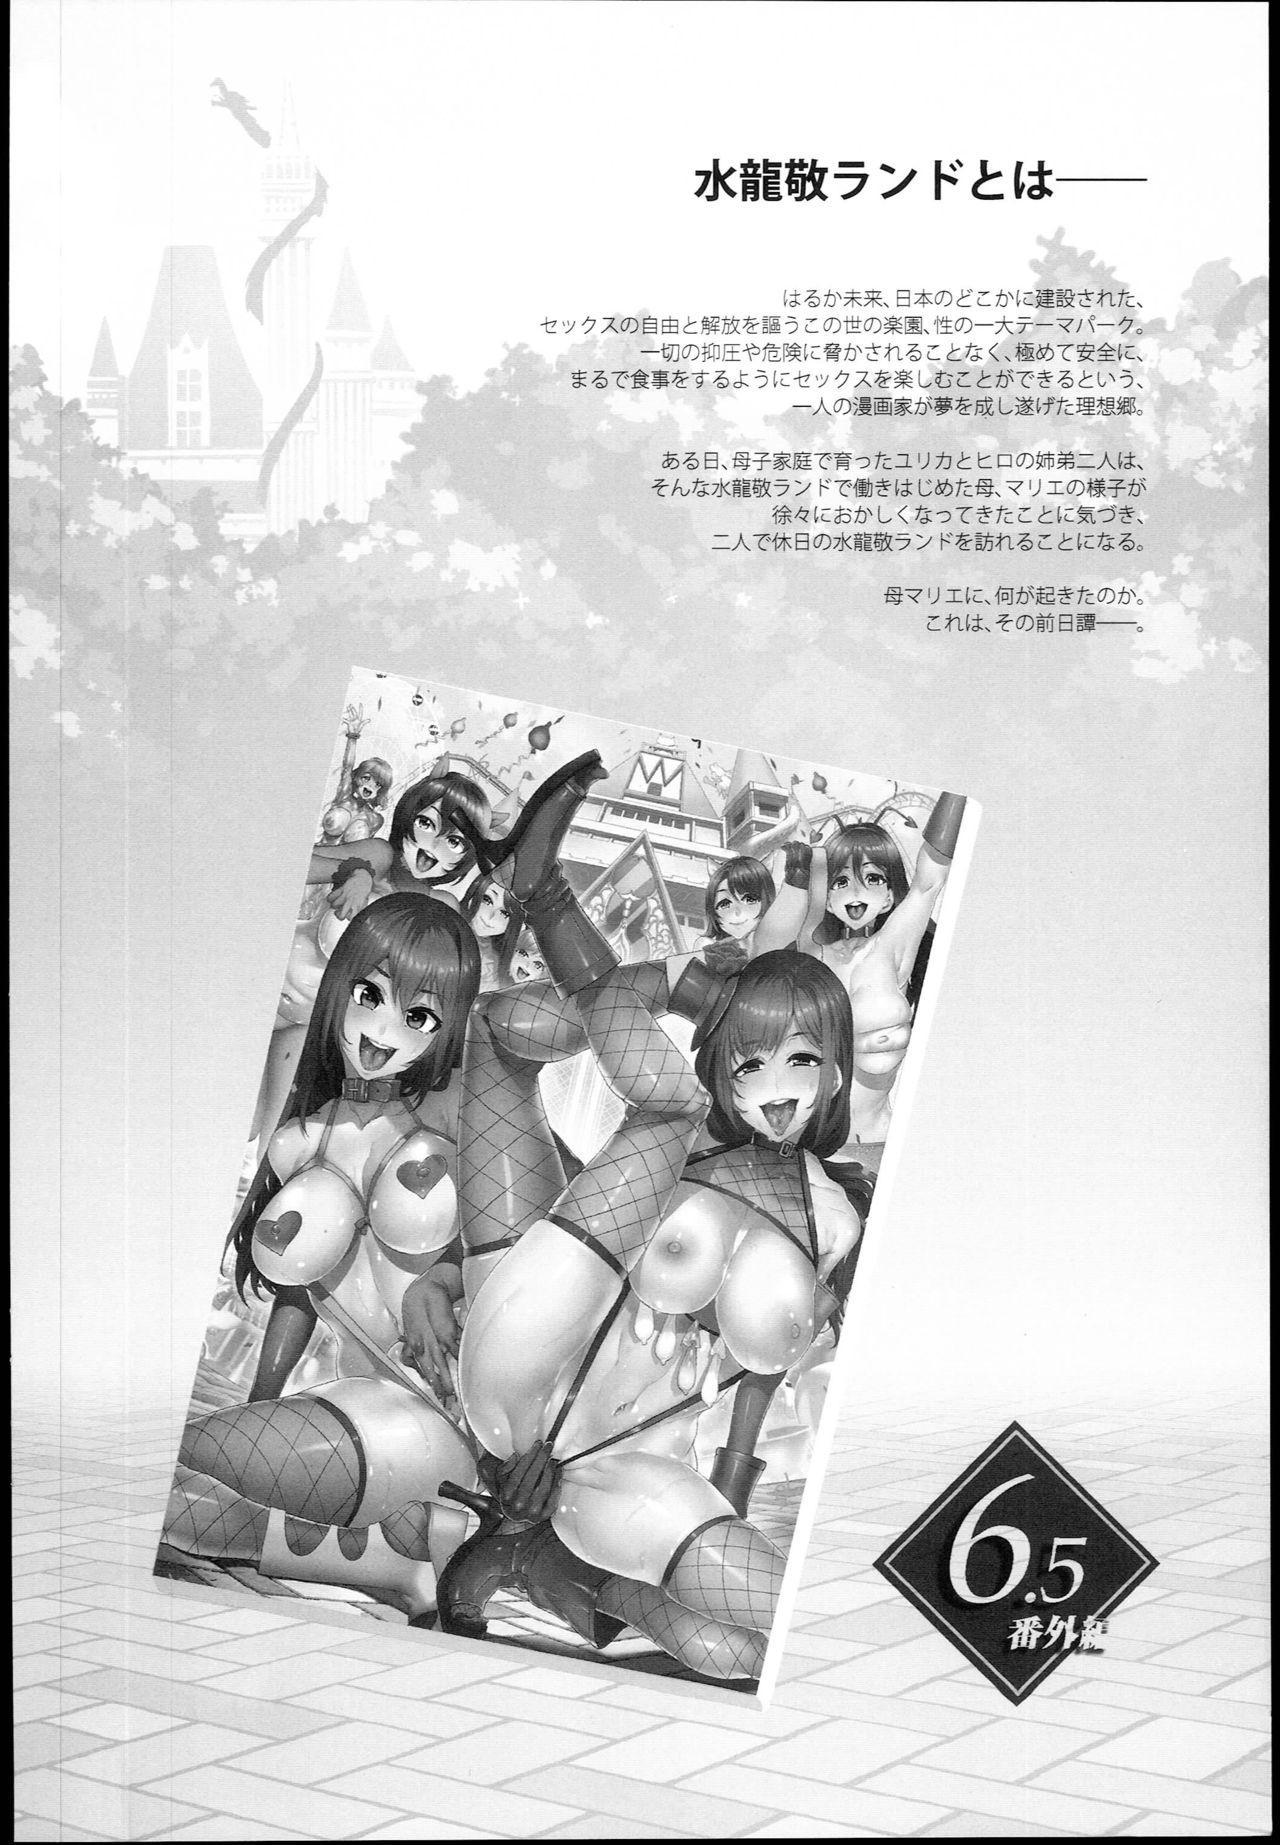 Oideyo! Mizuryu Kei Land the 6.5 Bangaihen - Kazoku to Sukebe na Theme Park! 5